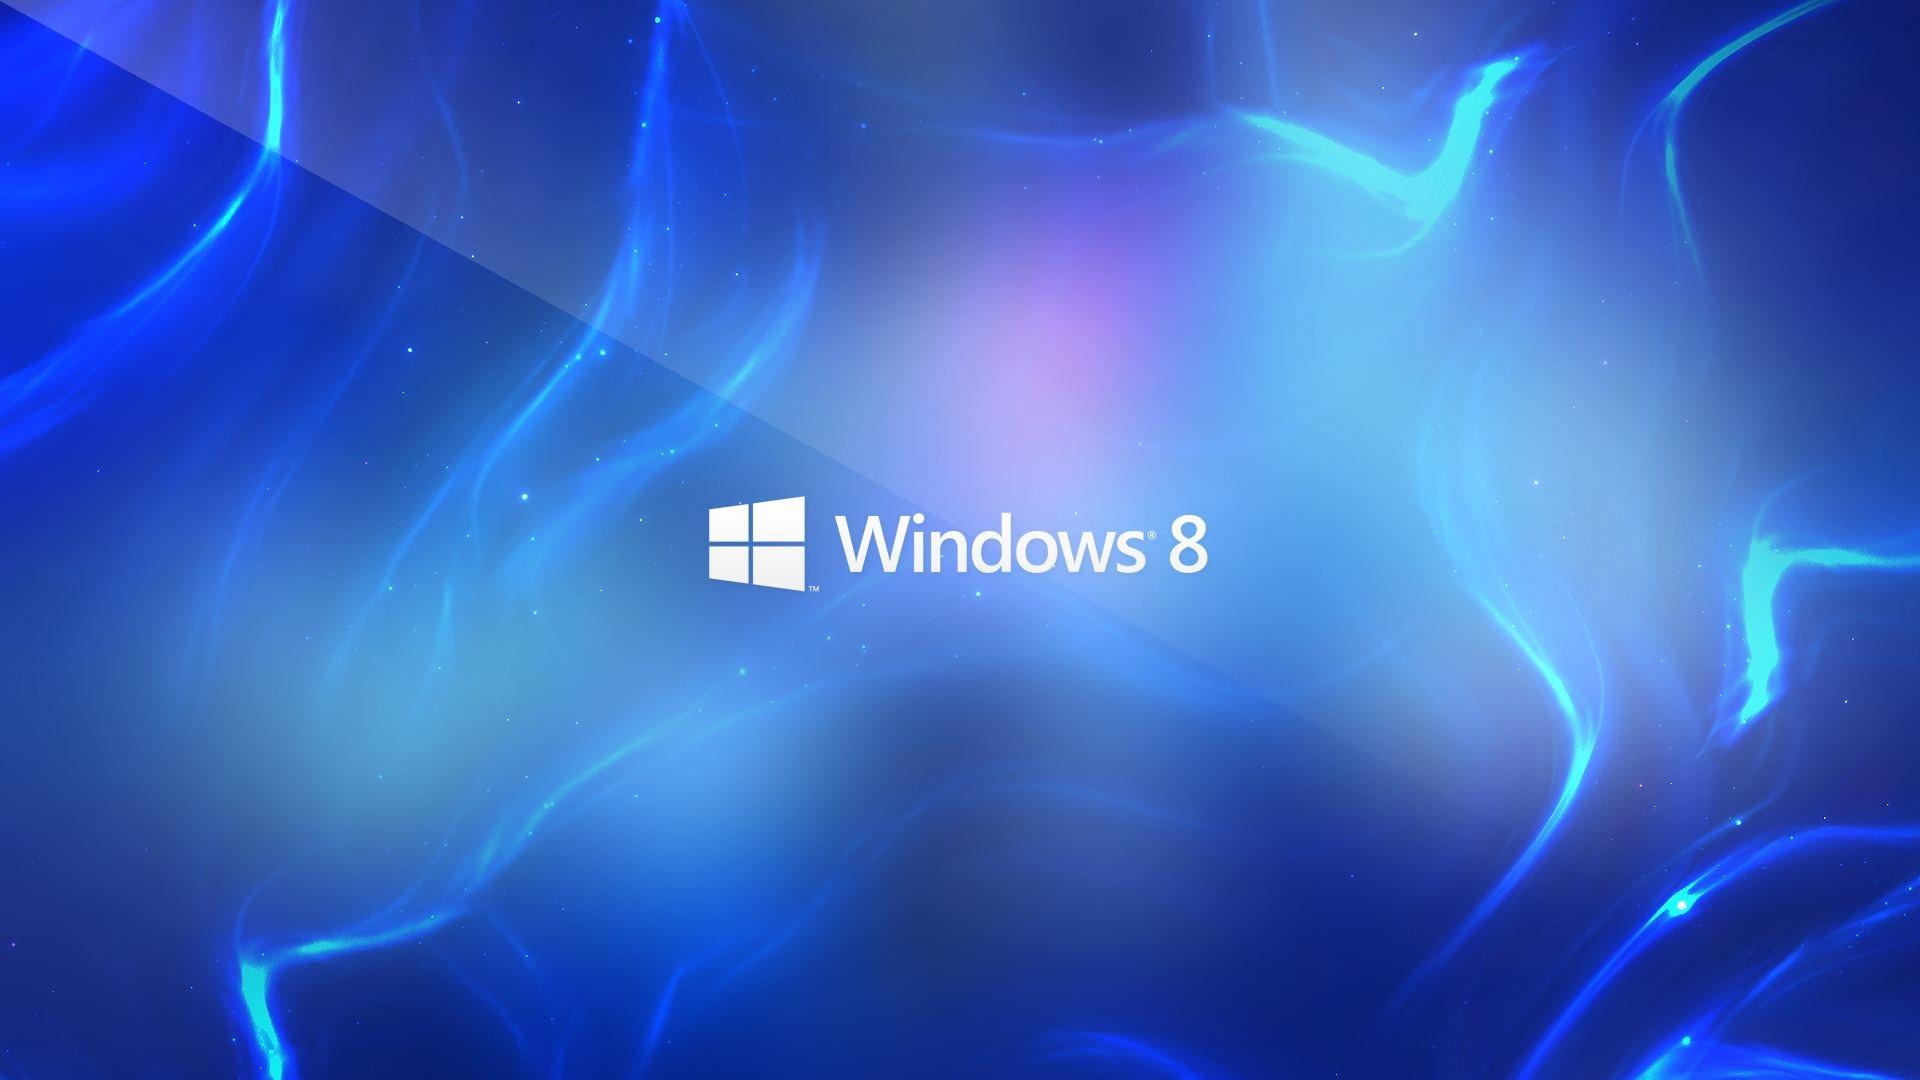 Windows 8 Hd обои фон 1920x1080 Id461330 Wallpaper